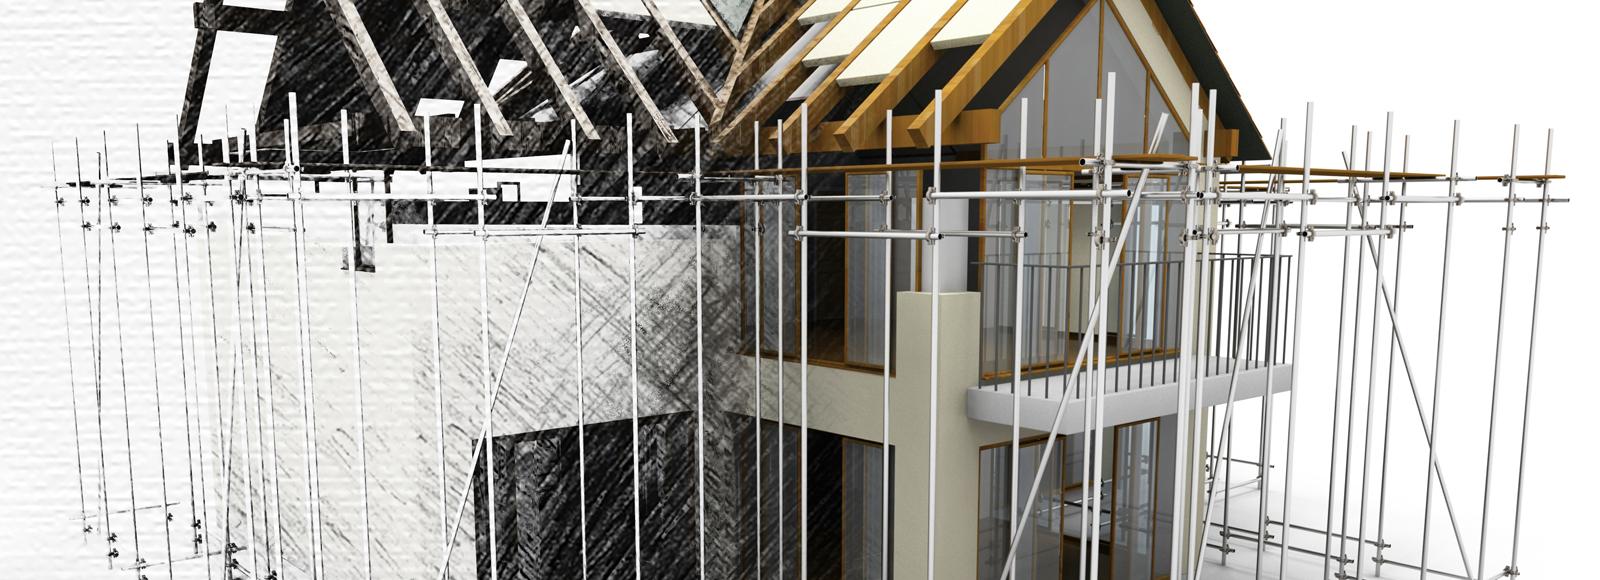 Gebäude, Modell